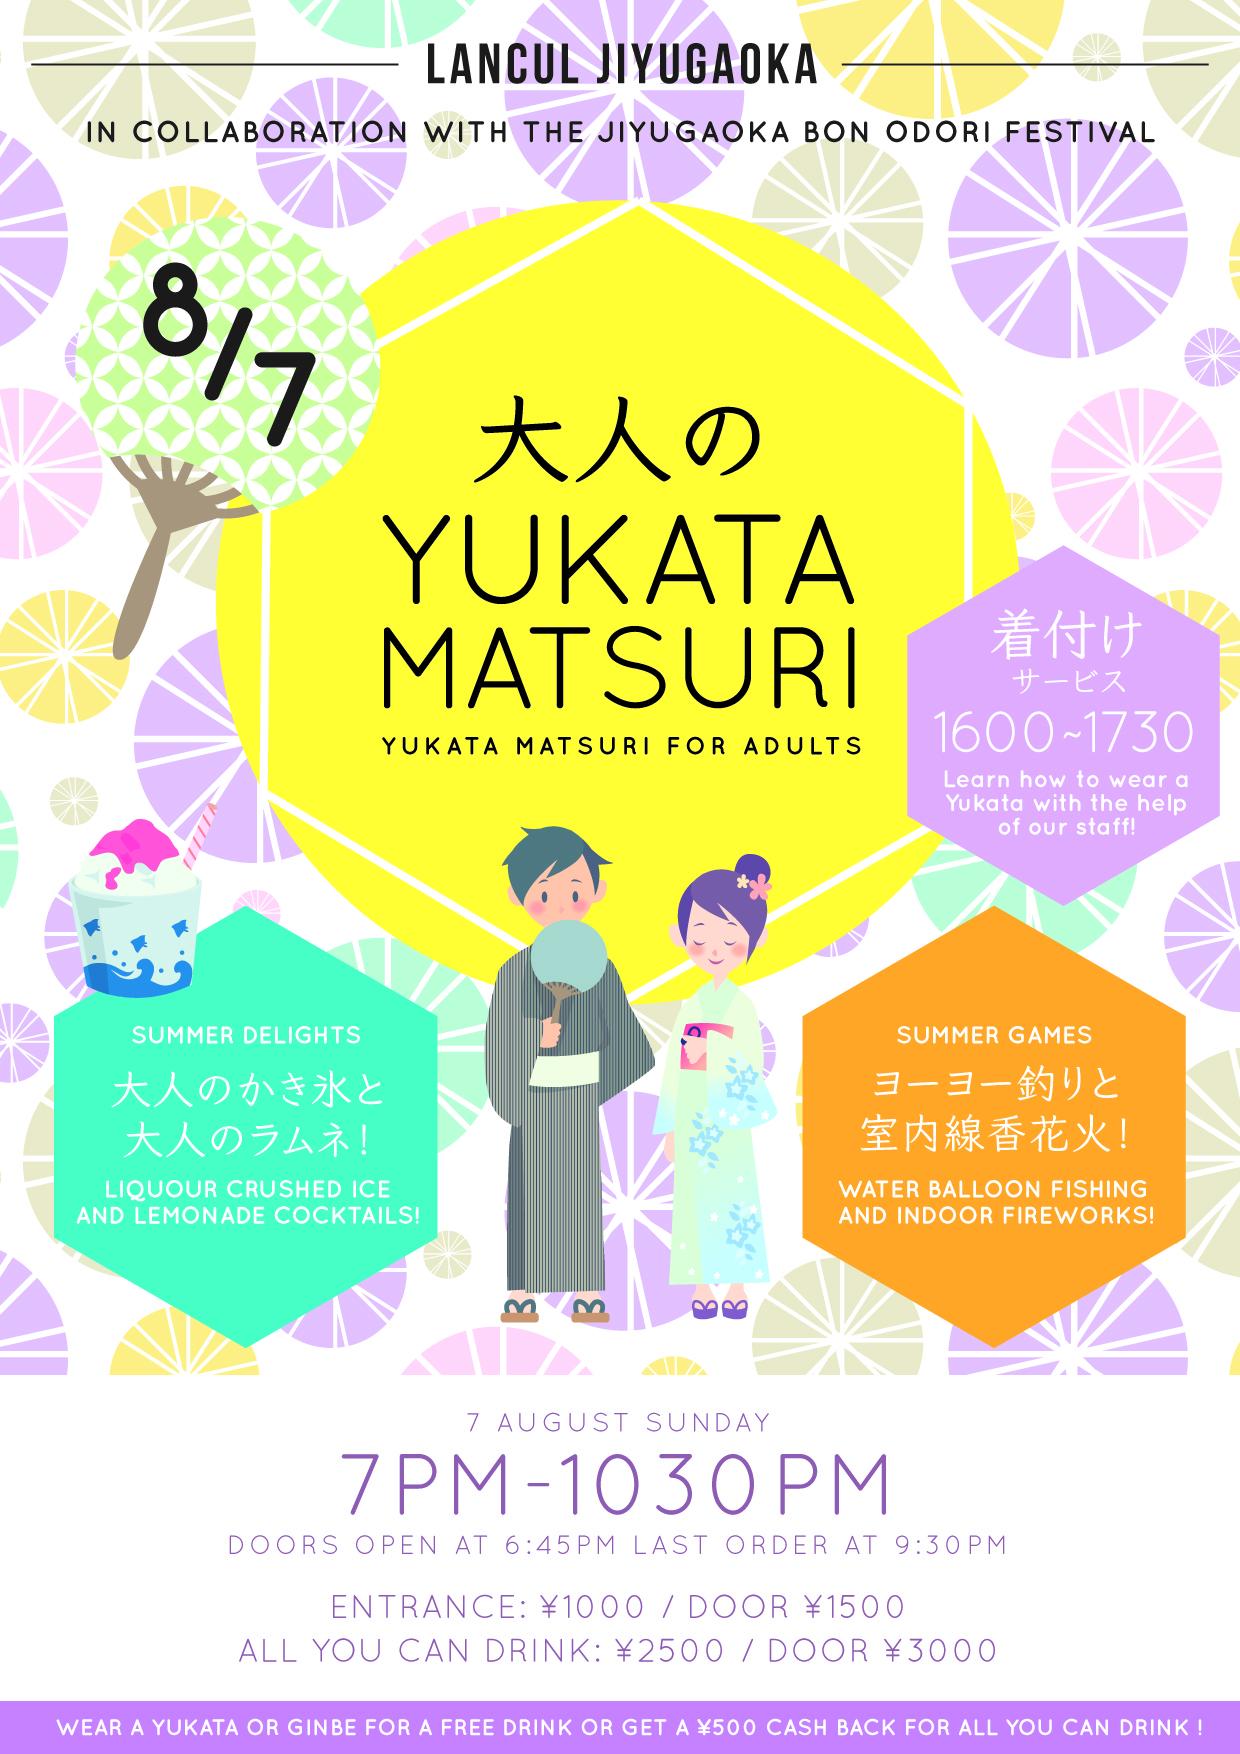 Yukata matsuri 浴衣祭り パーティー 自由が丘 英会話 カフェ ランカル LanCul